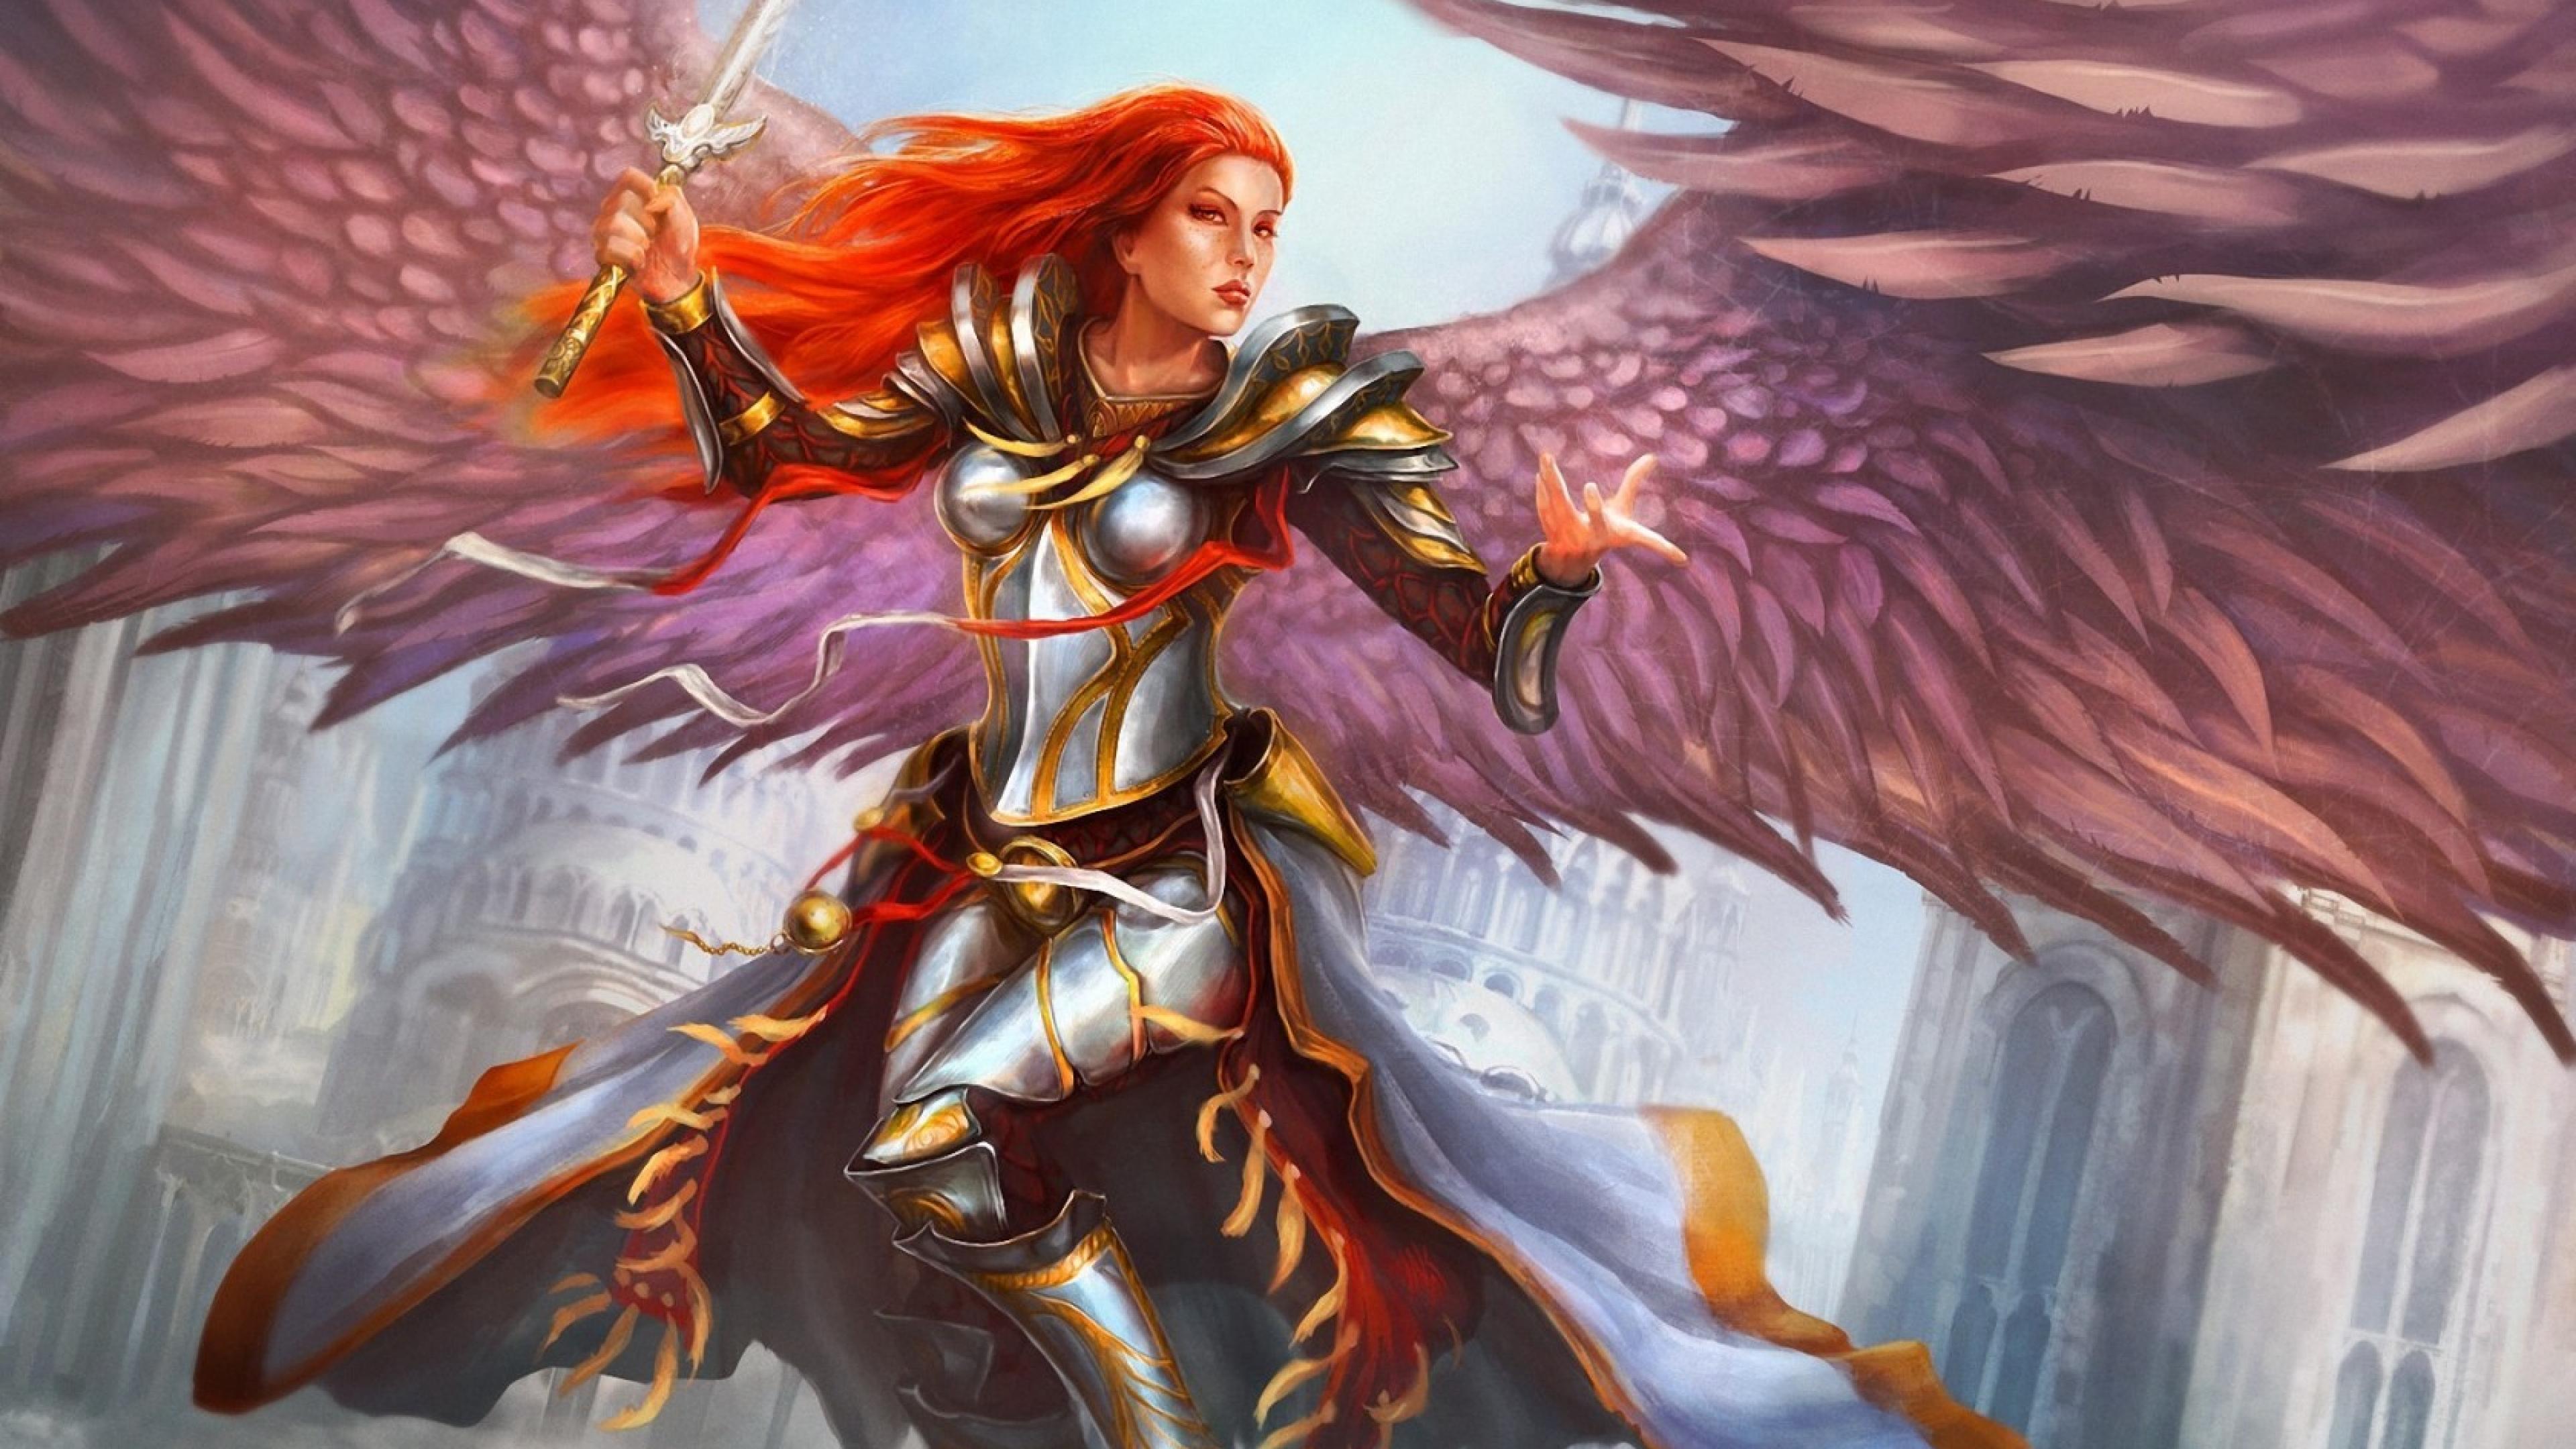 Gothic Girl Wallpaper Fantasy Angel Redhead Fantasy Girl Feather Wings Ultra 3840x2160